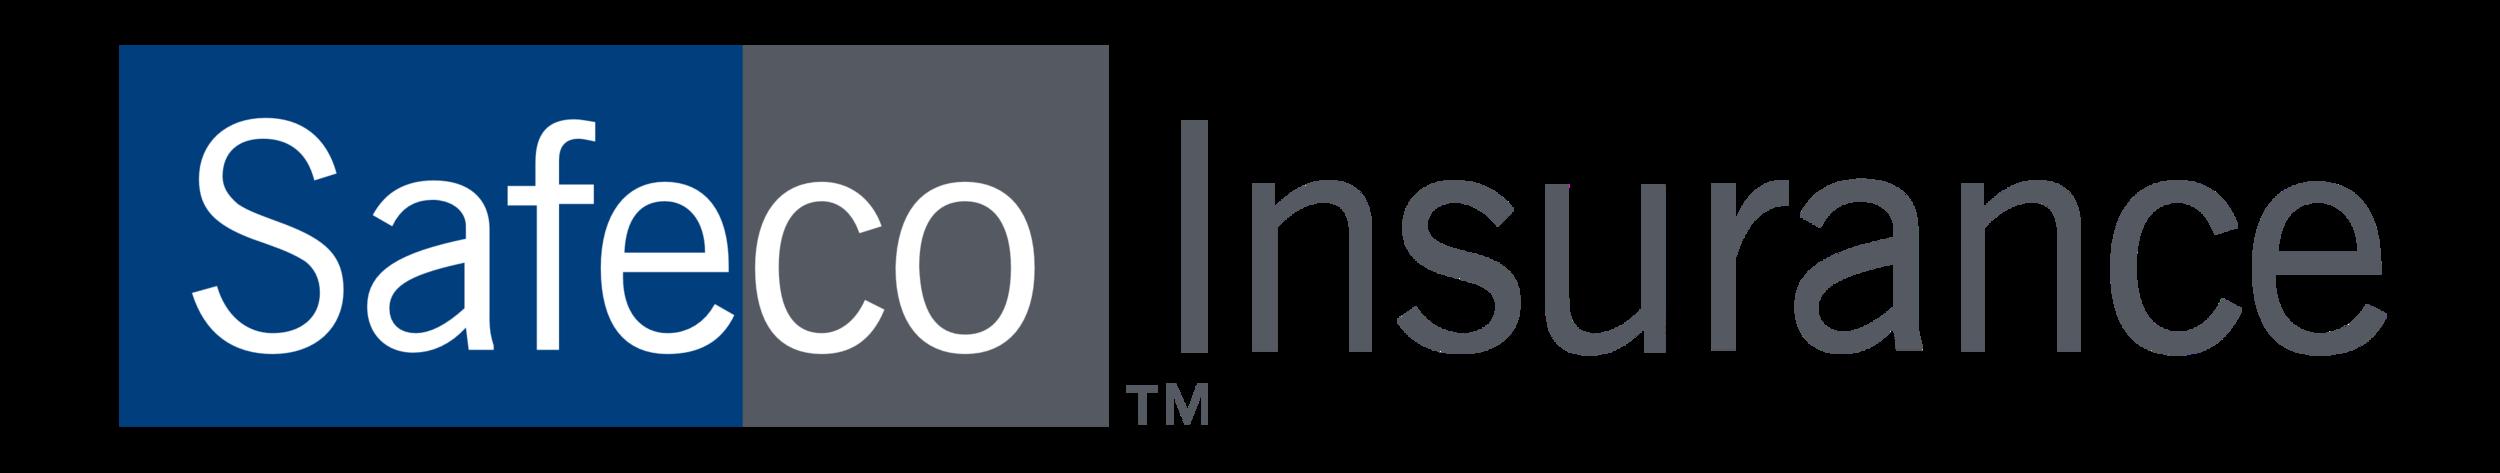 Safeco_Insurance_logo_logotype.png